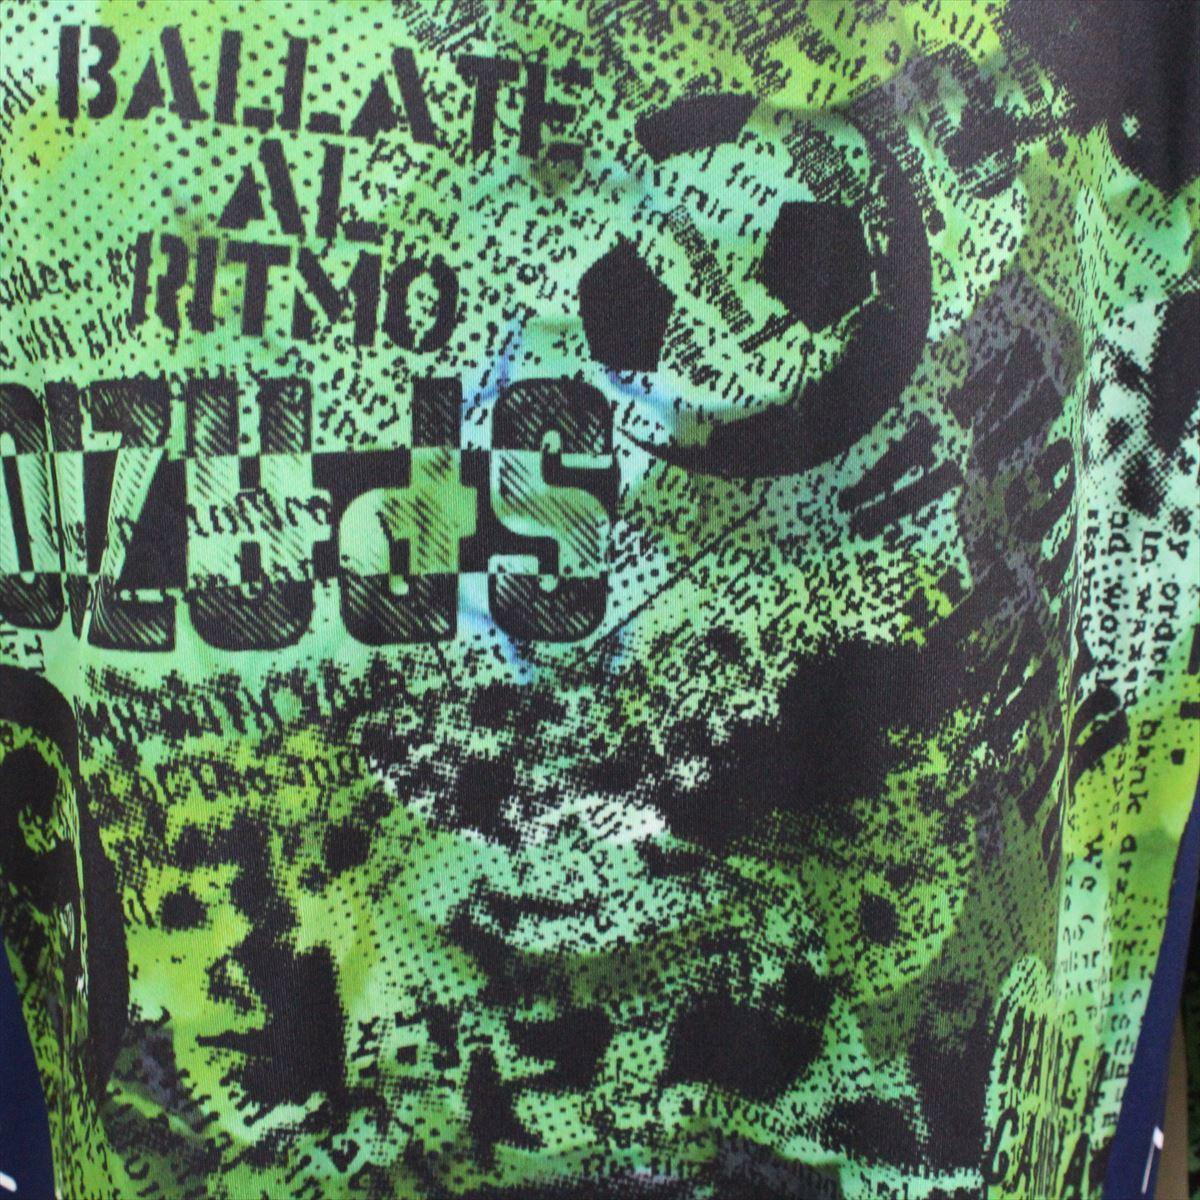 SPAZIO スパッツィオ メンズ長袖シャツ グリーン Oサイズ 新品 フットサル ロングスリーブ 吸水速乾 UVケア_画像3